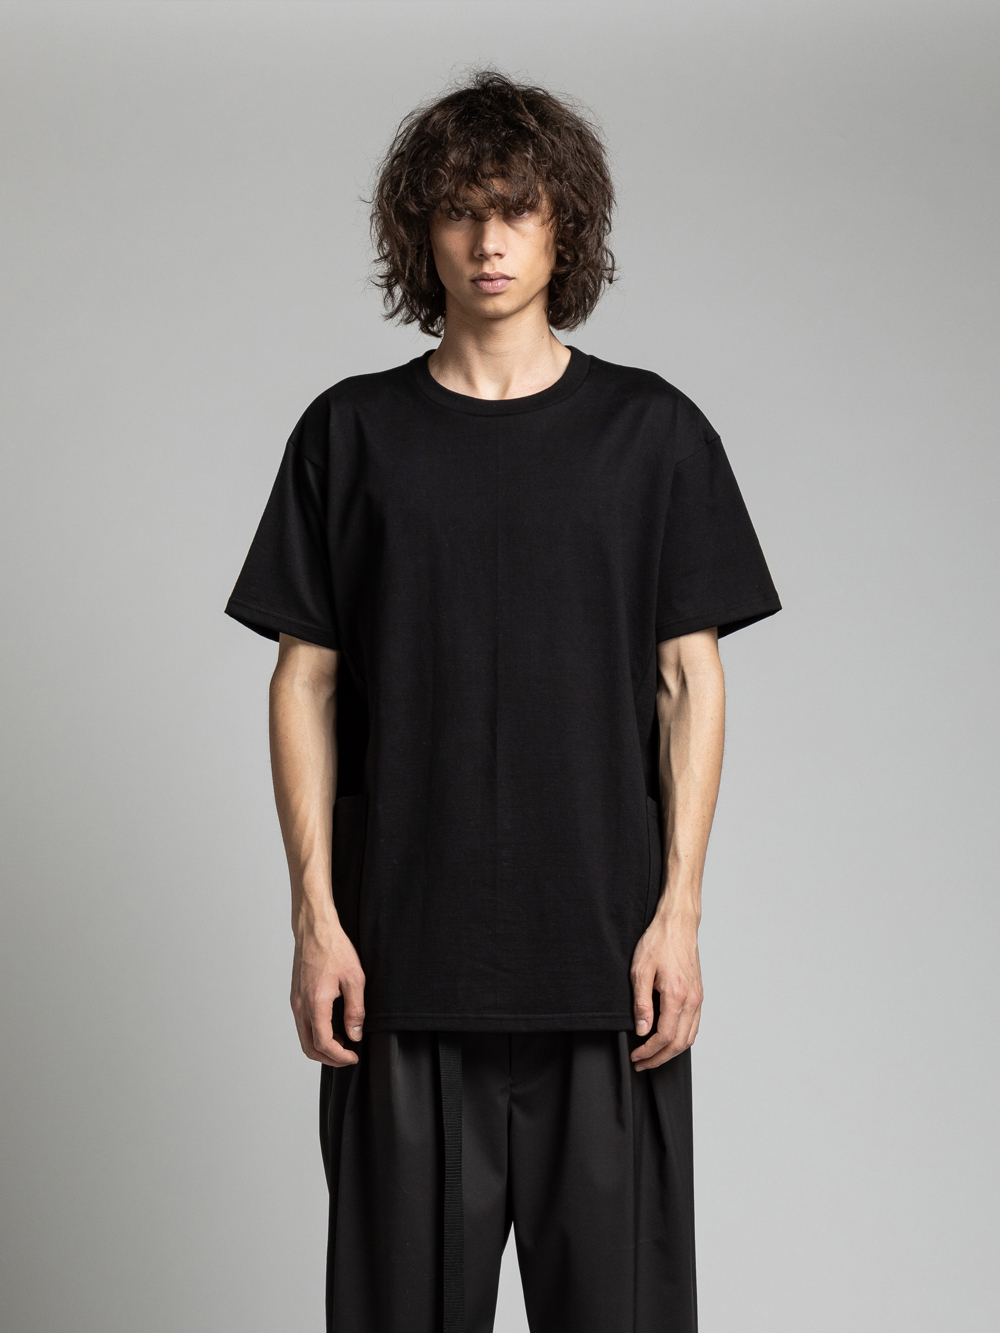 VI-3157-01 / 40/-天竺 裾ポケット 半袖カットソー